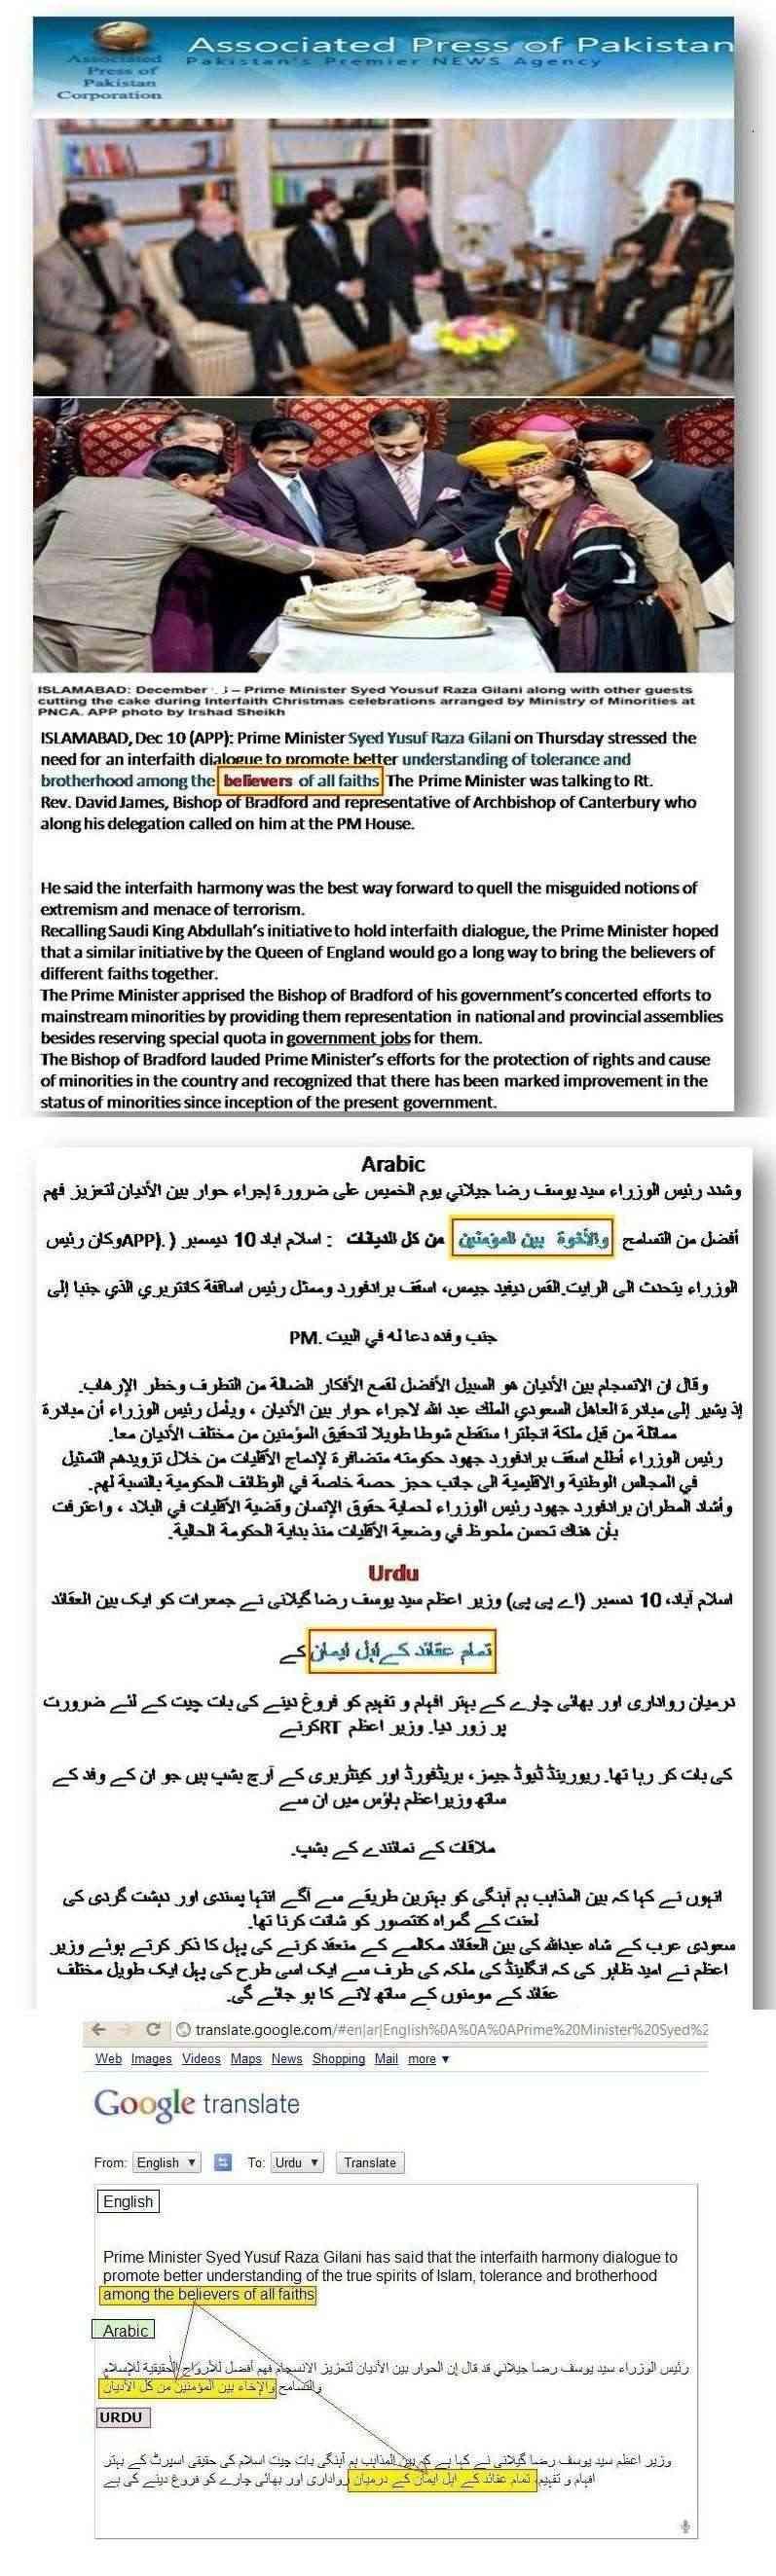 fazal fatwa Fatwa_27